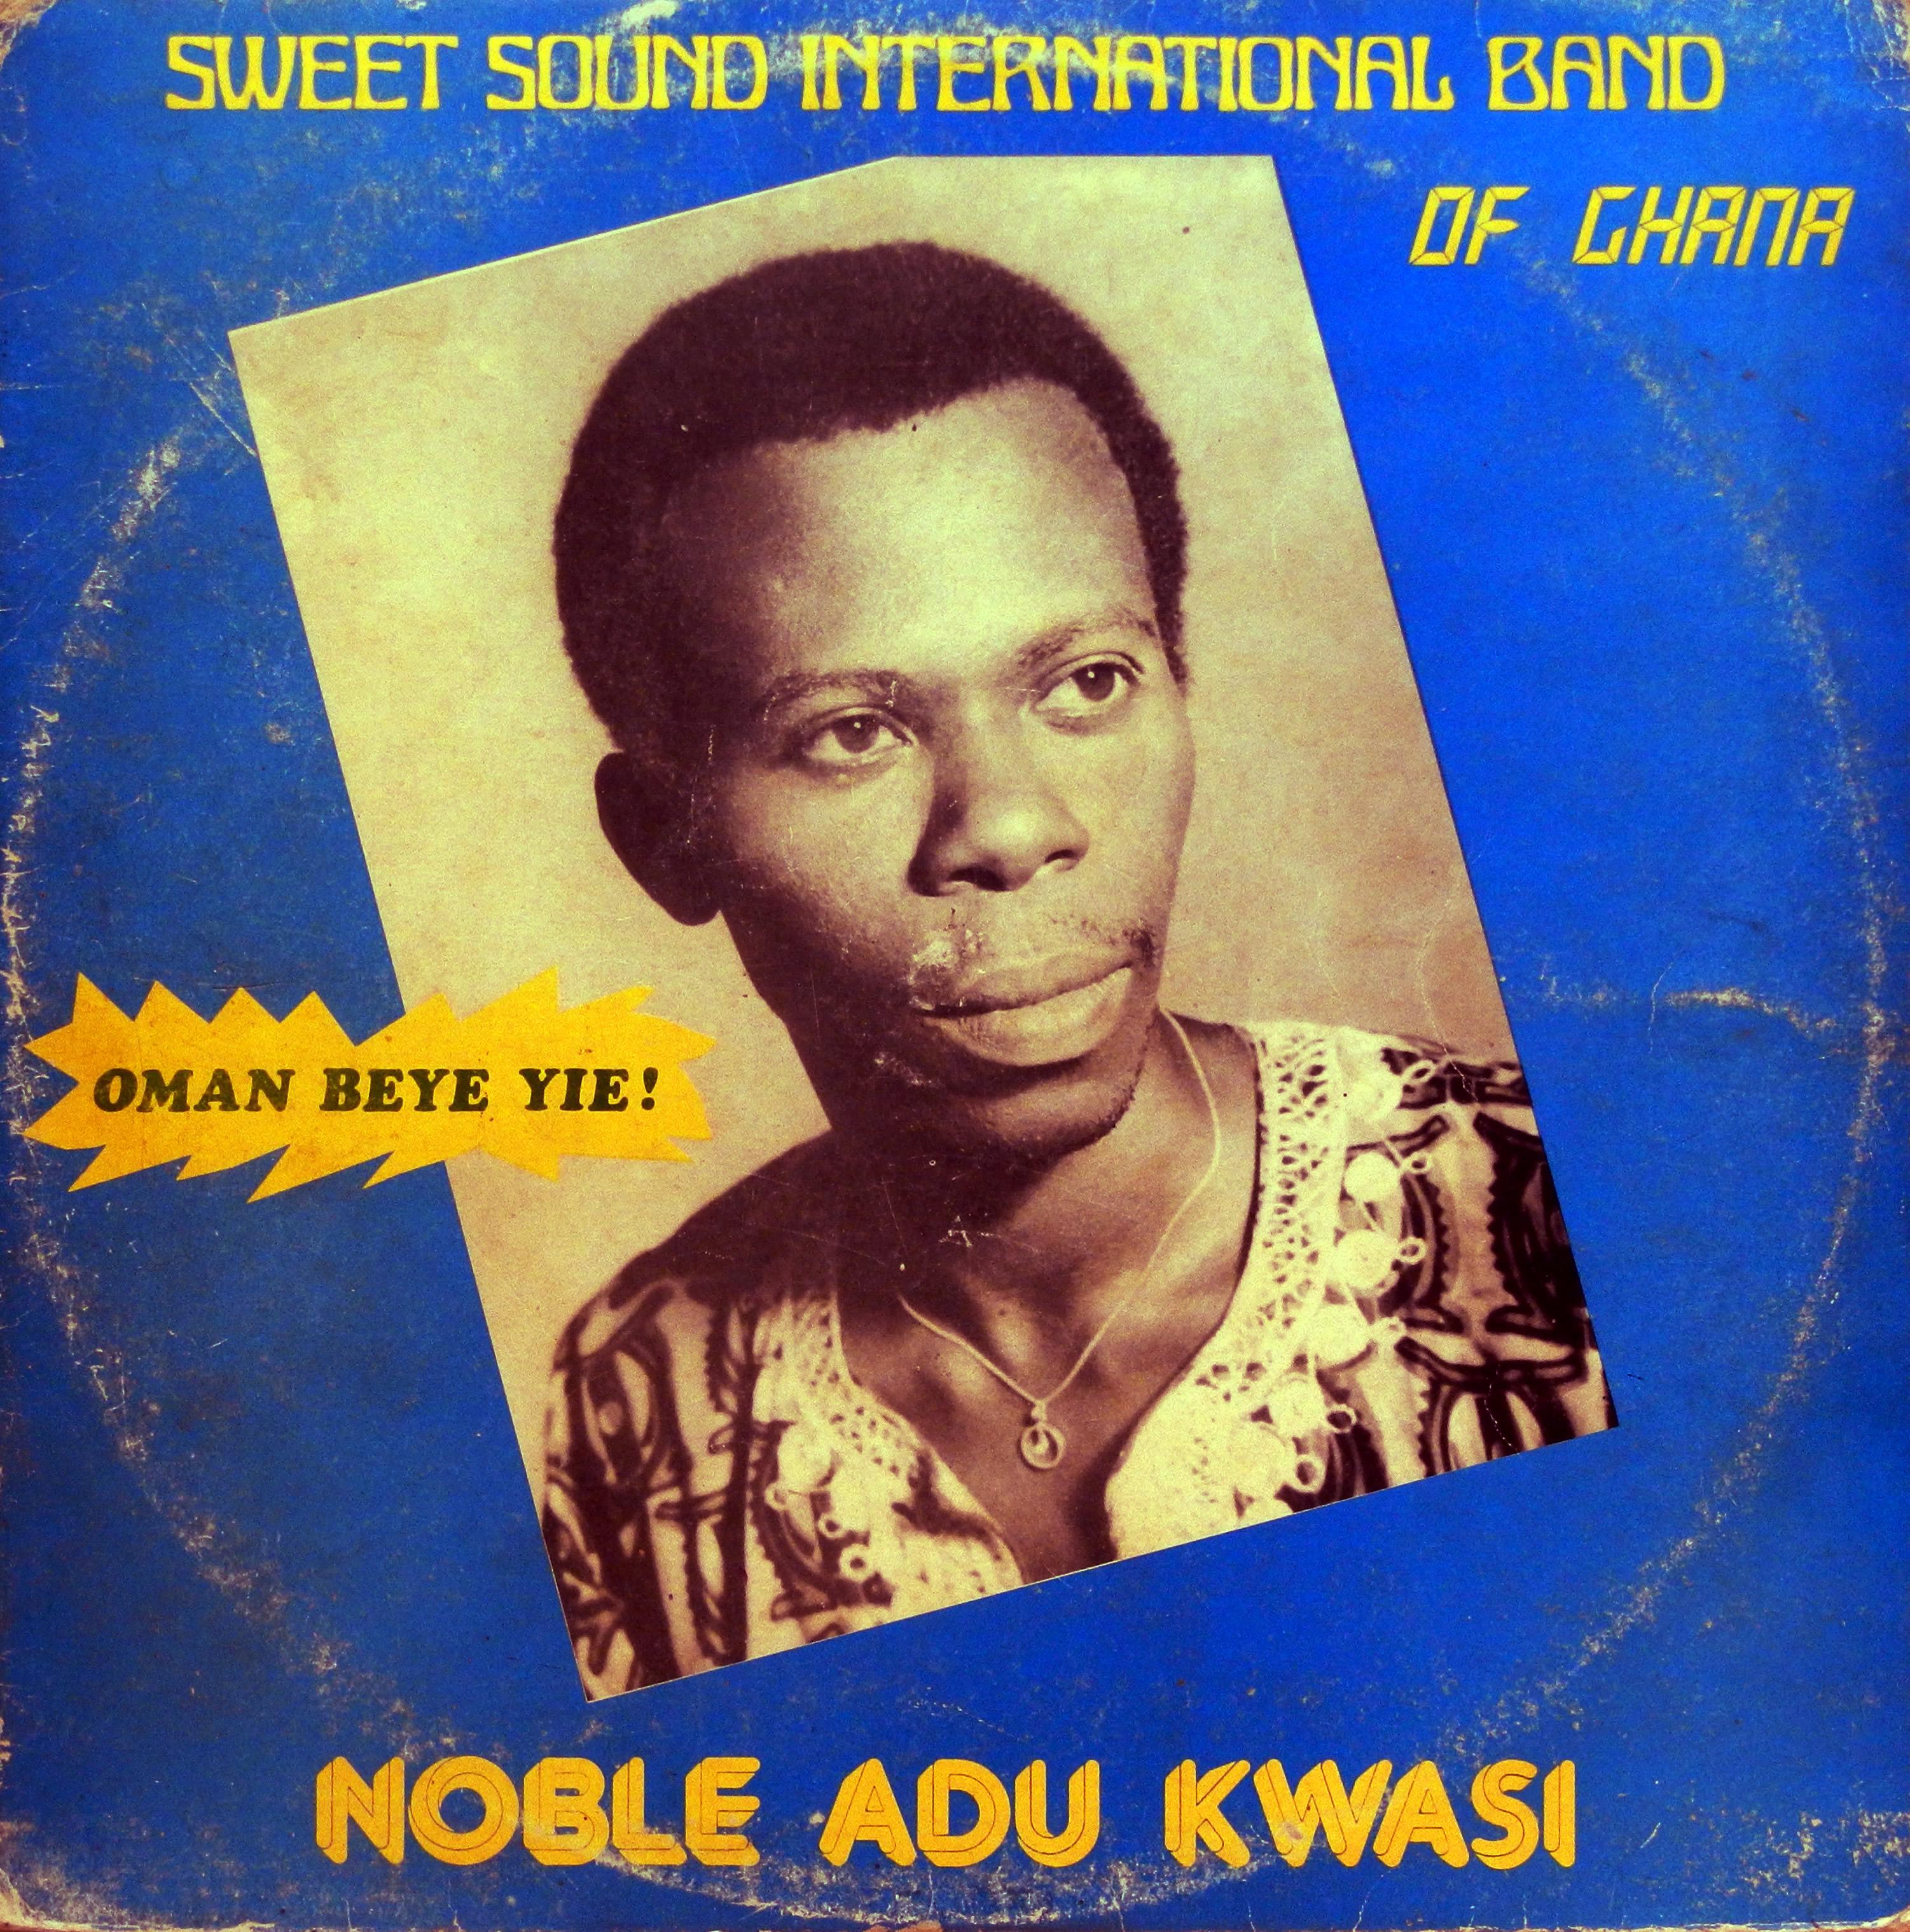 Adu Kwasi His Sweet Sound Band Oman Beye Yie